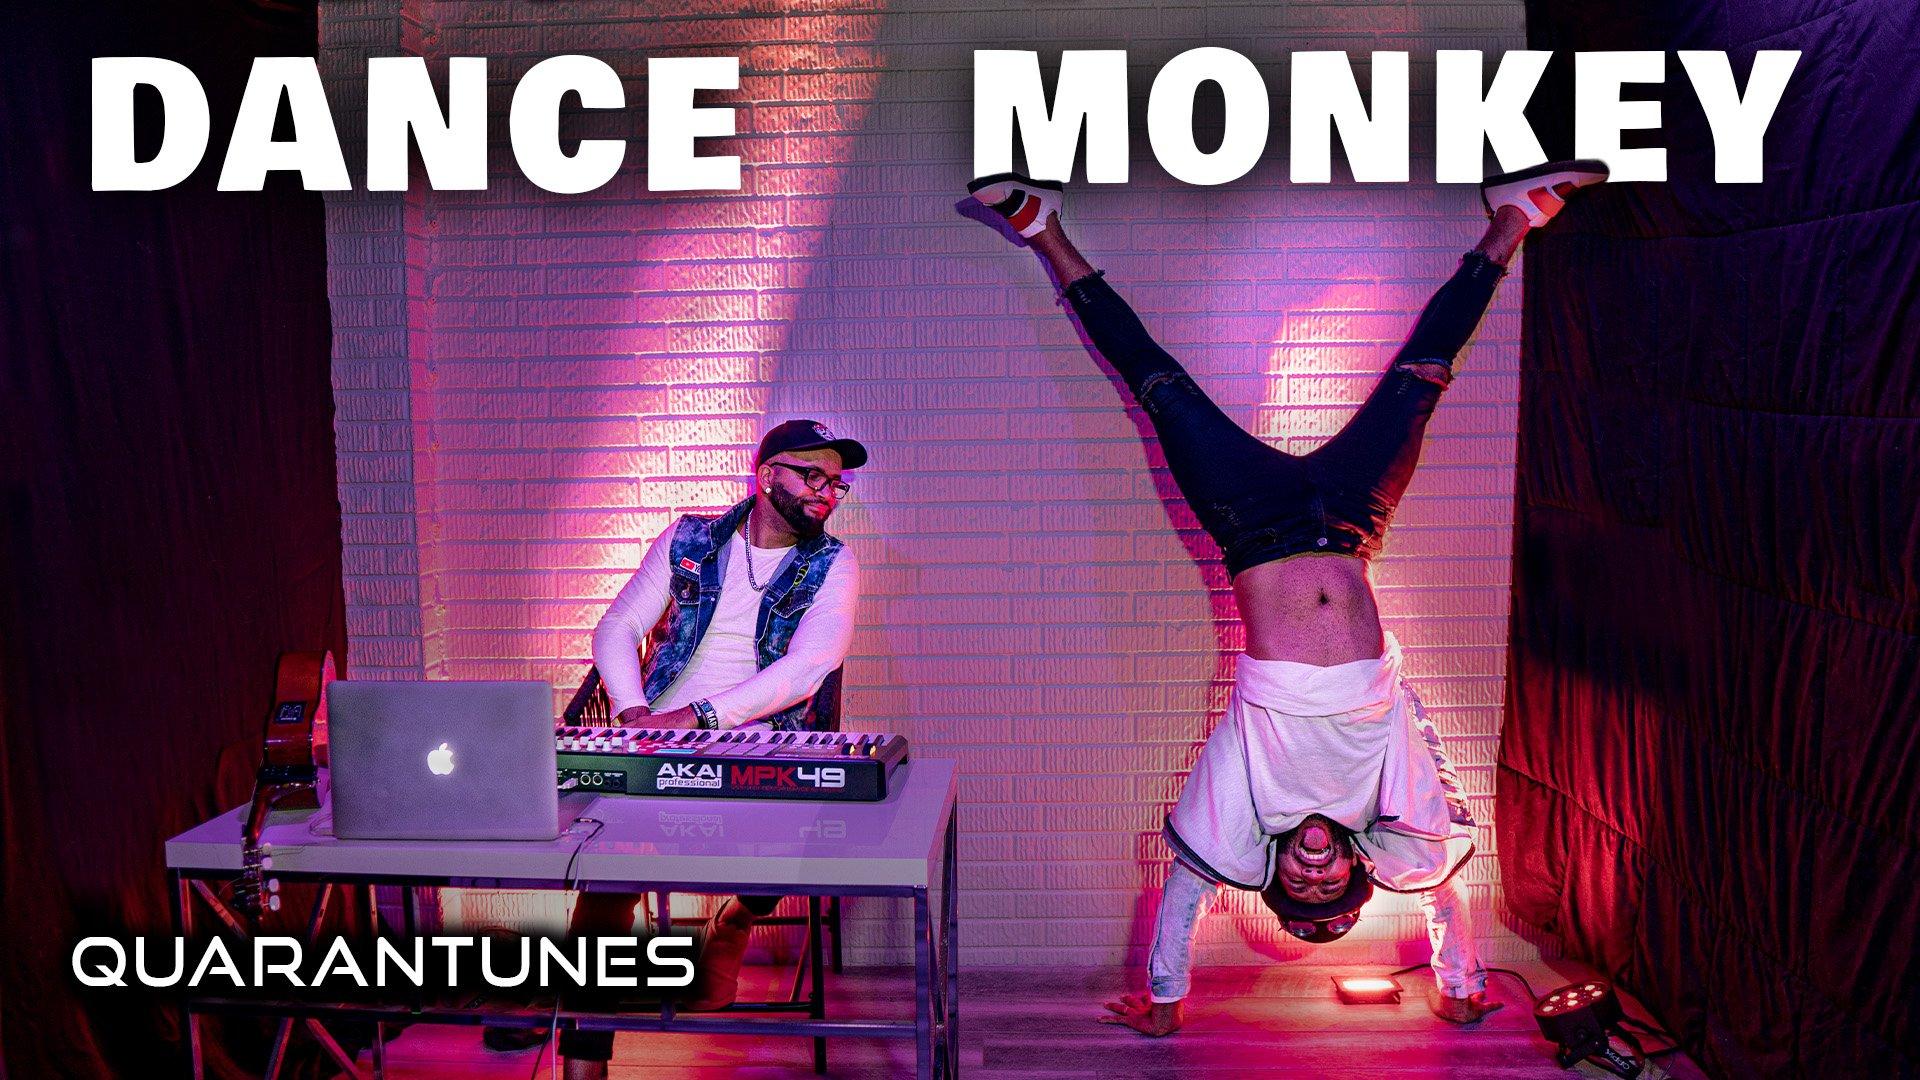 dance monkey tones and I violin keys ukulele cover b2wins